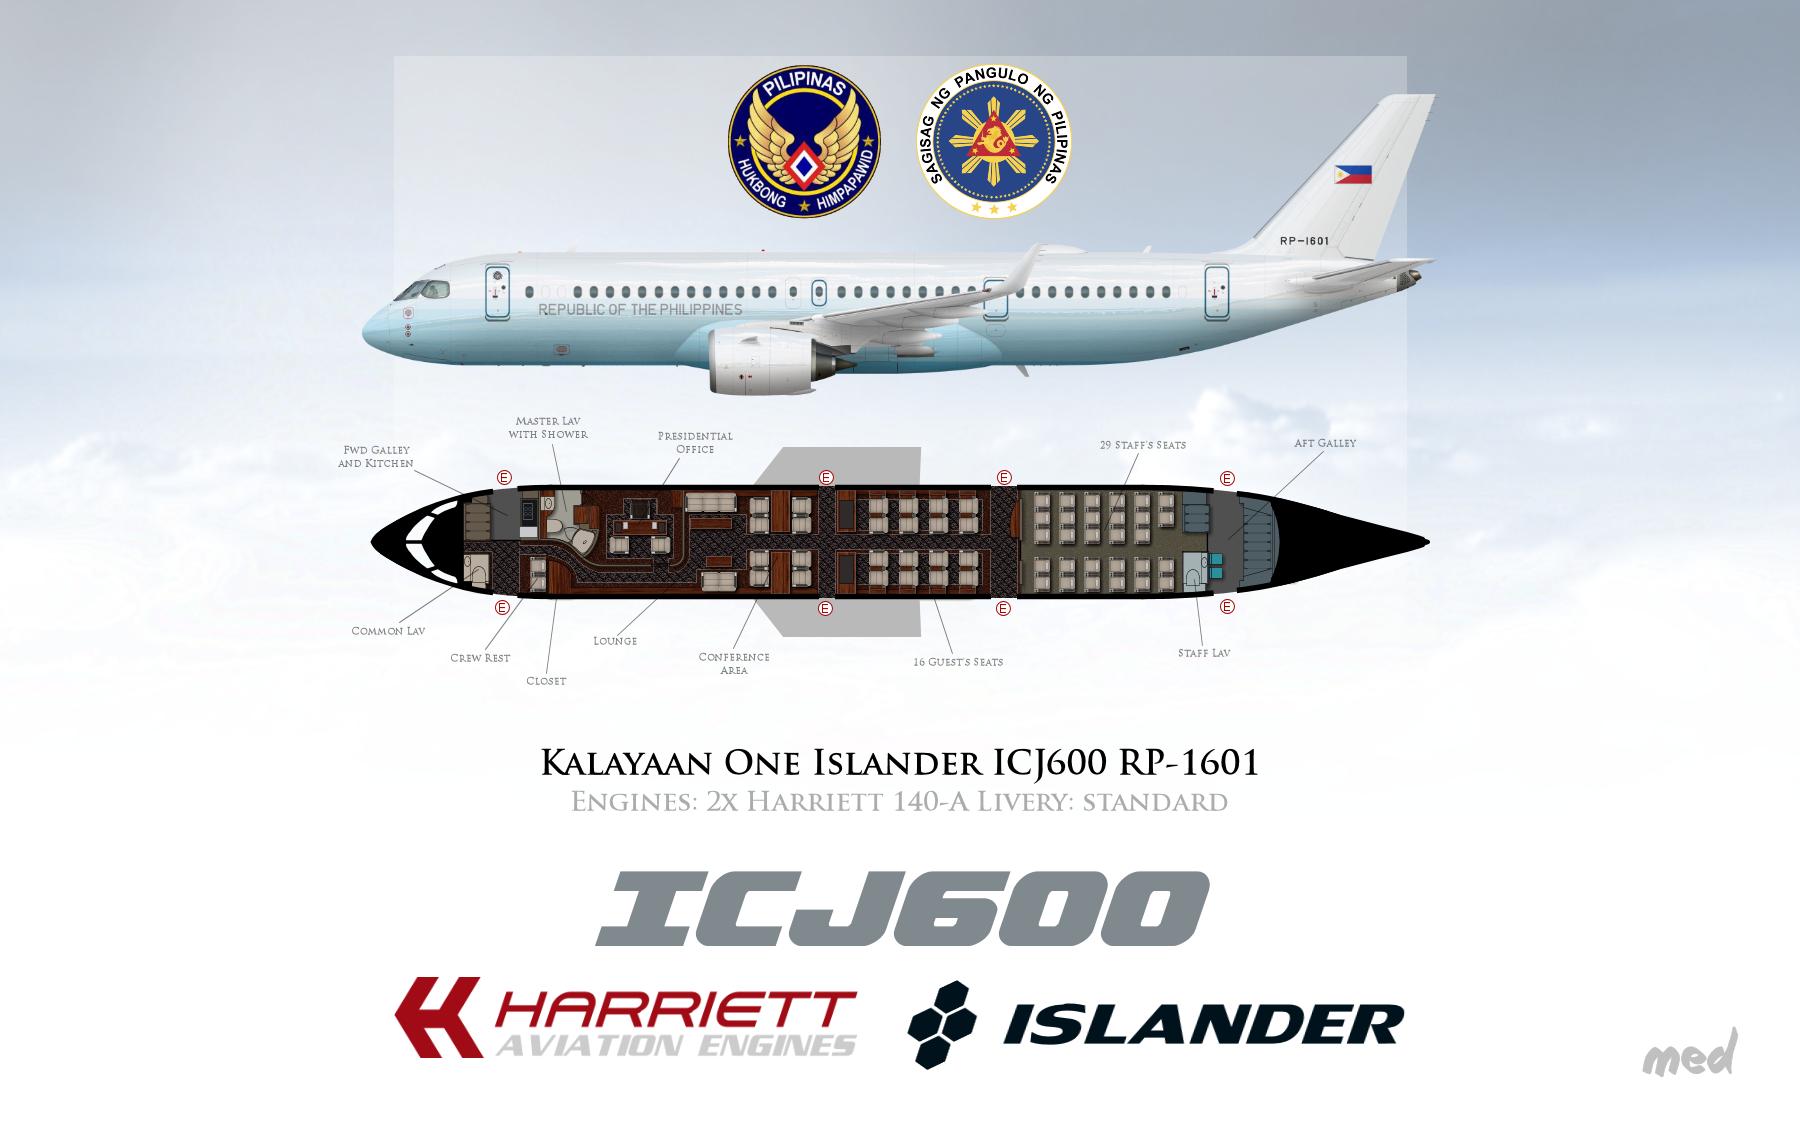 Islander ICJ600 Philippines - Government - Islander - Gallery ...